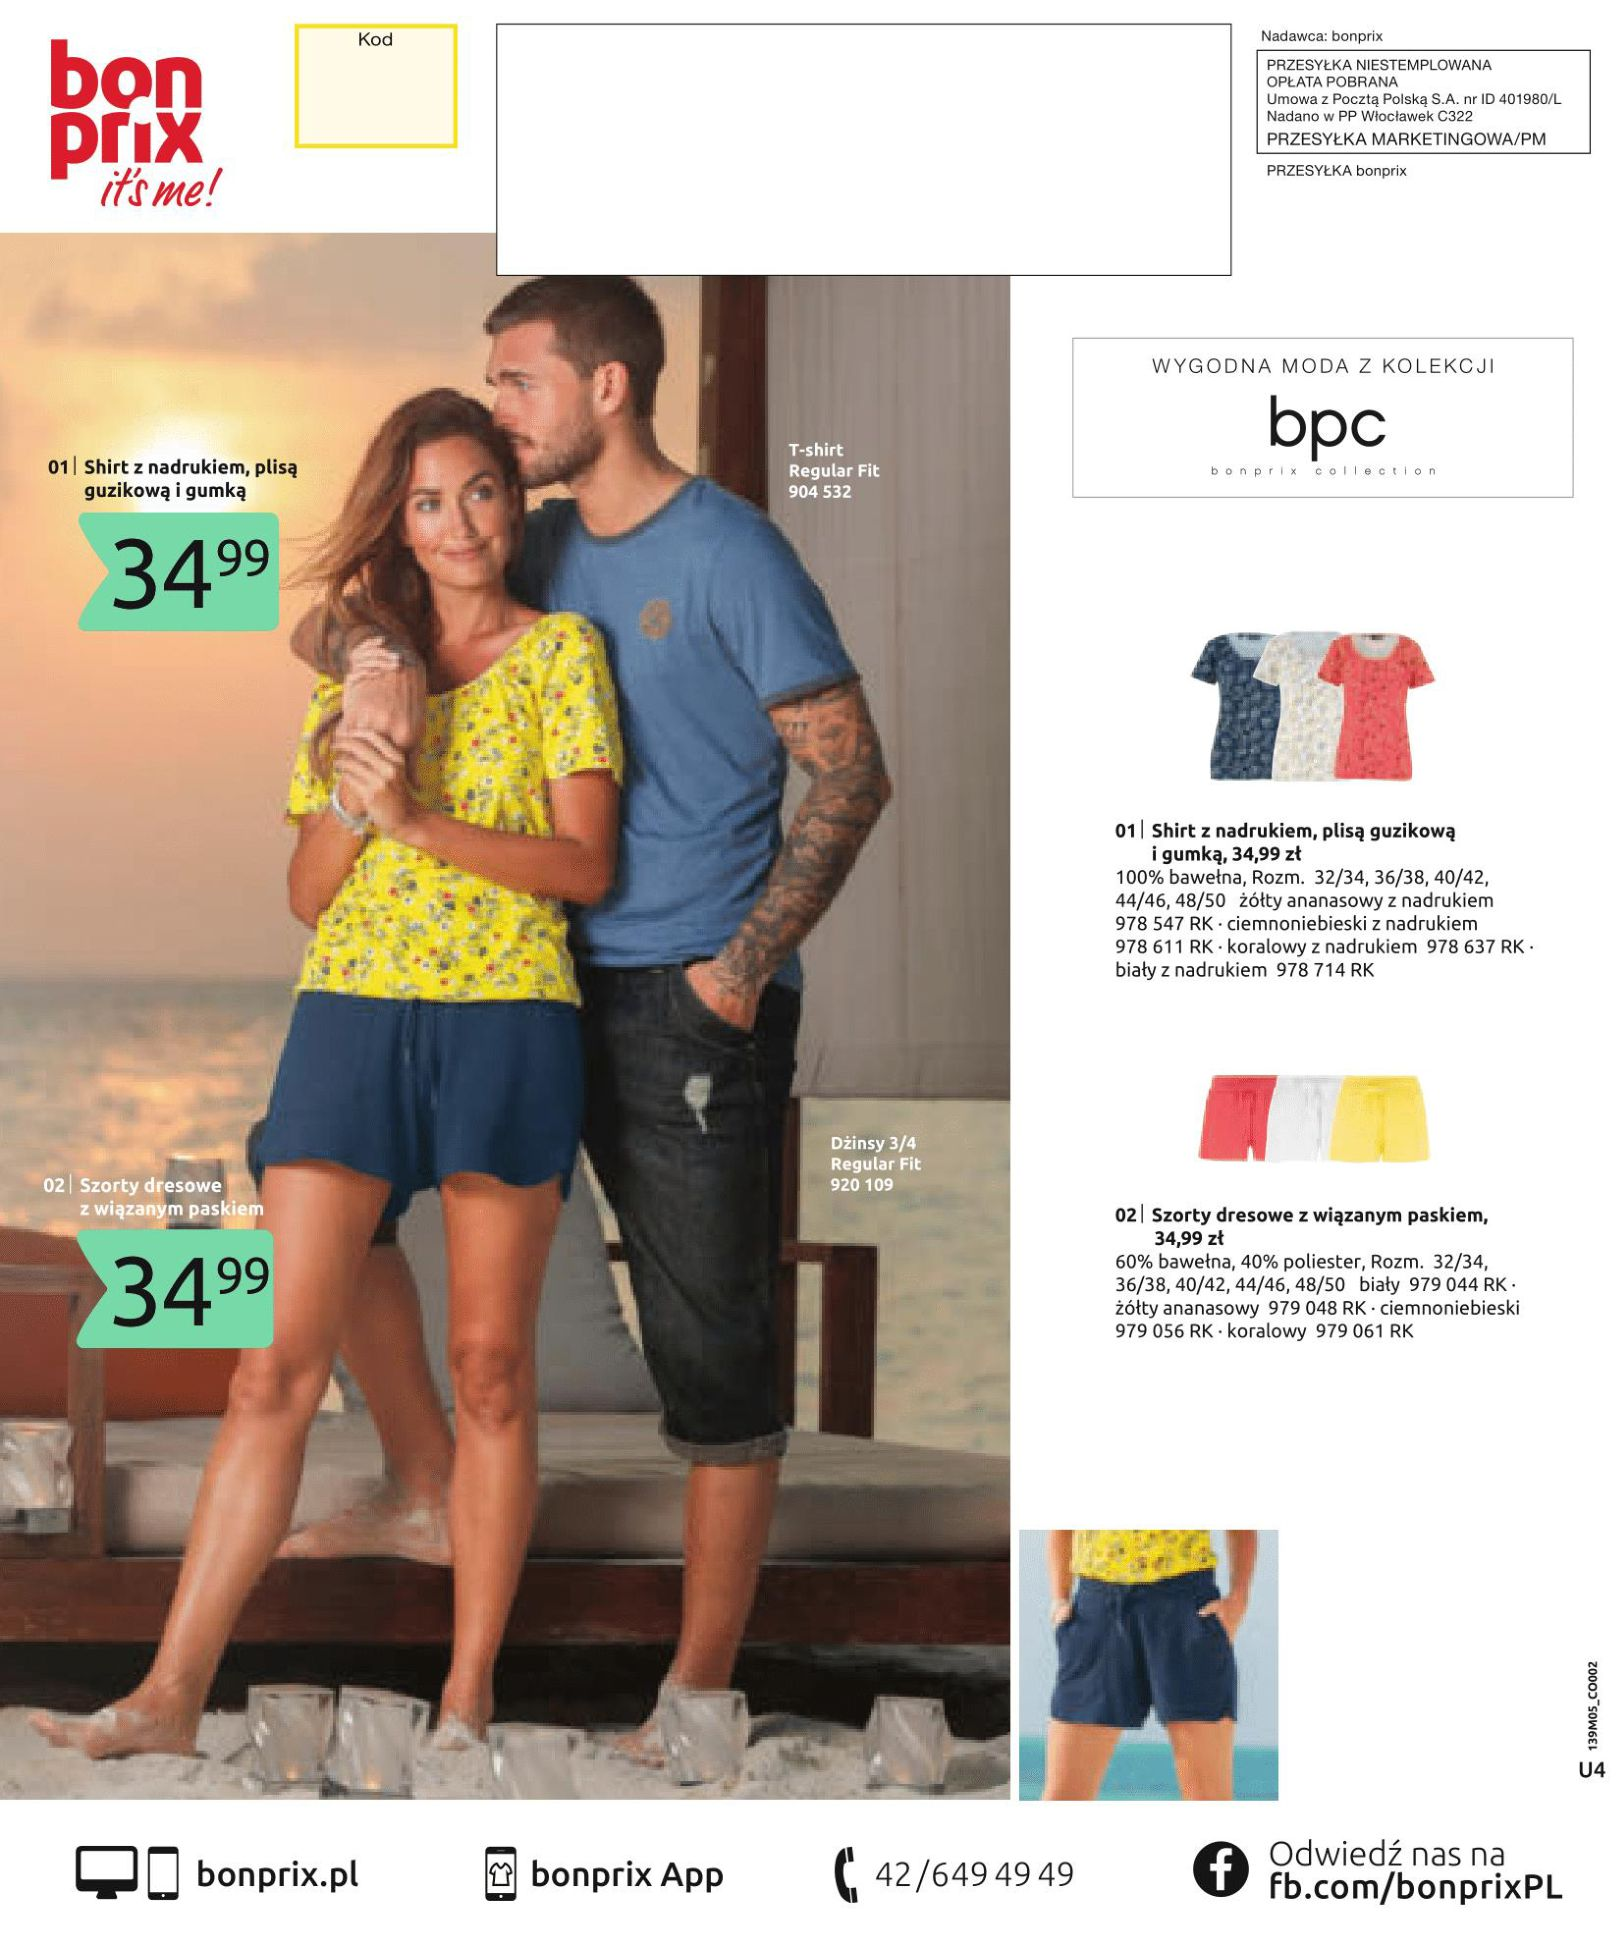 Gazetka Bonprix - Romantic Summer-02.07.2019-29.10.2019-page-100